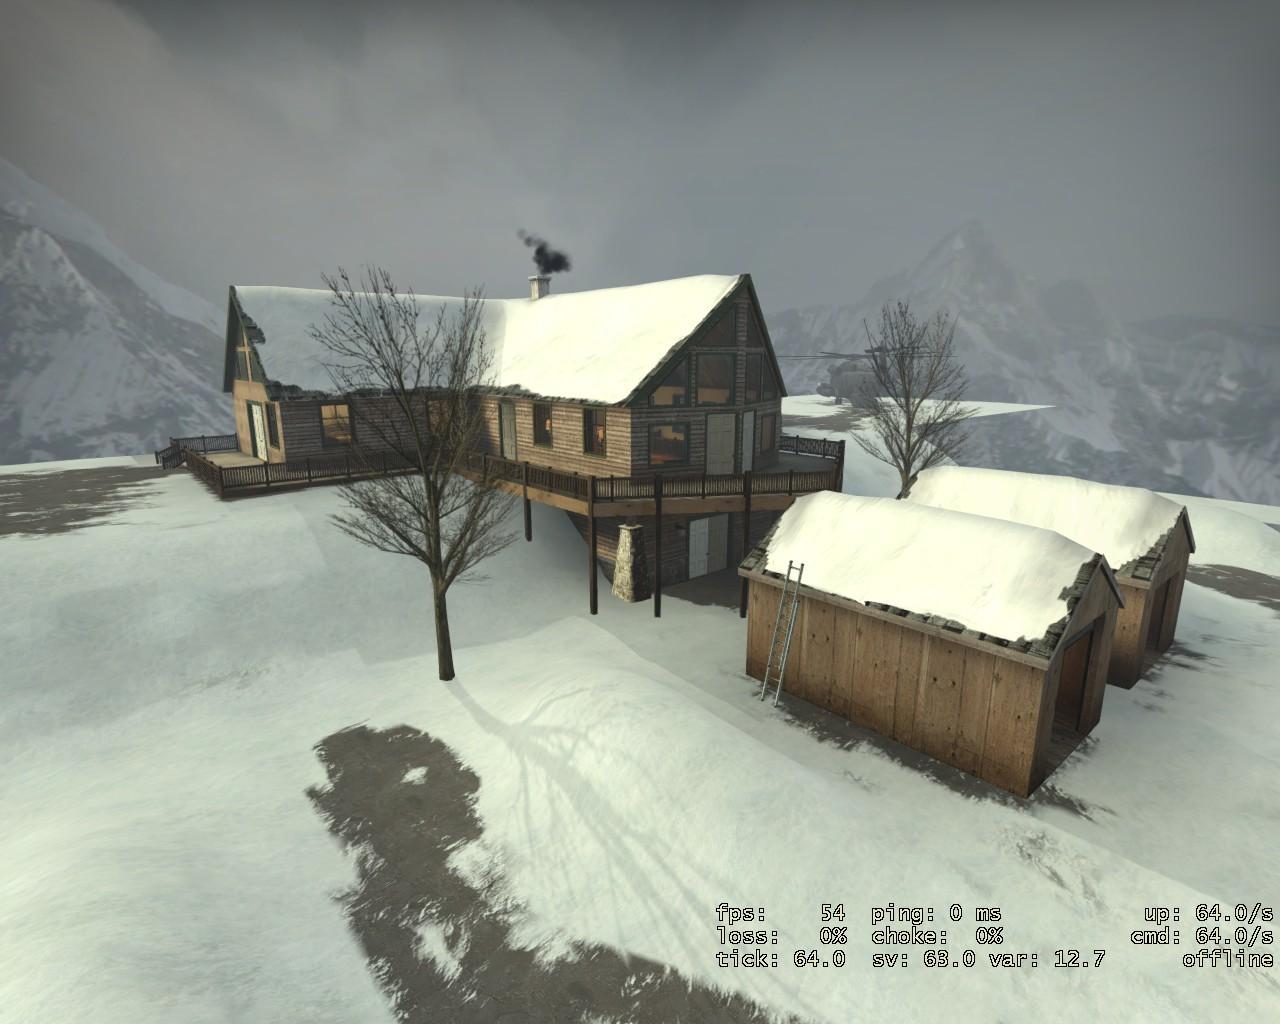 Ar_Winter_Lodge WiP screenshot #1